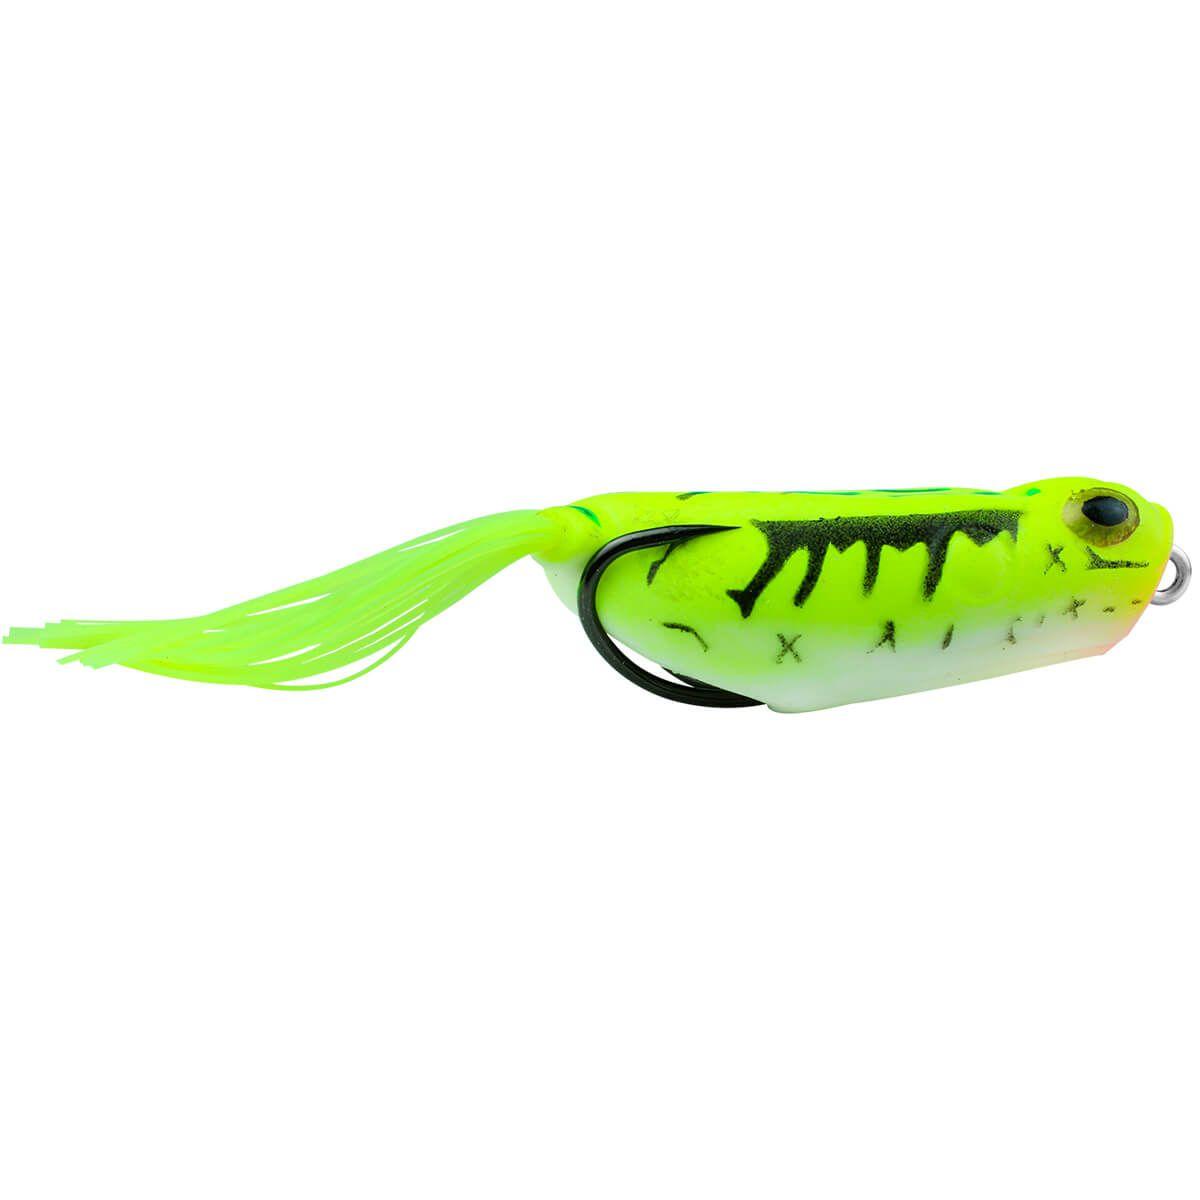 Isca Artificial Albatroz Fishing Pop Frog XY40 6 cm 14gr